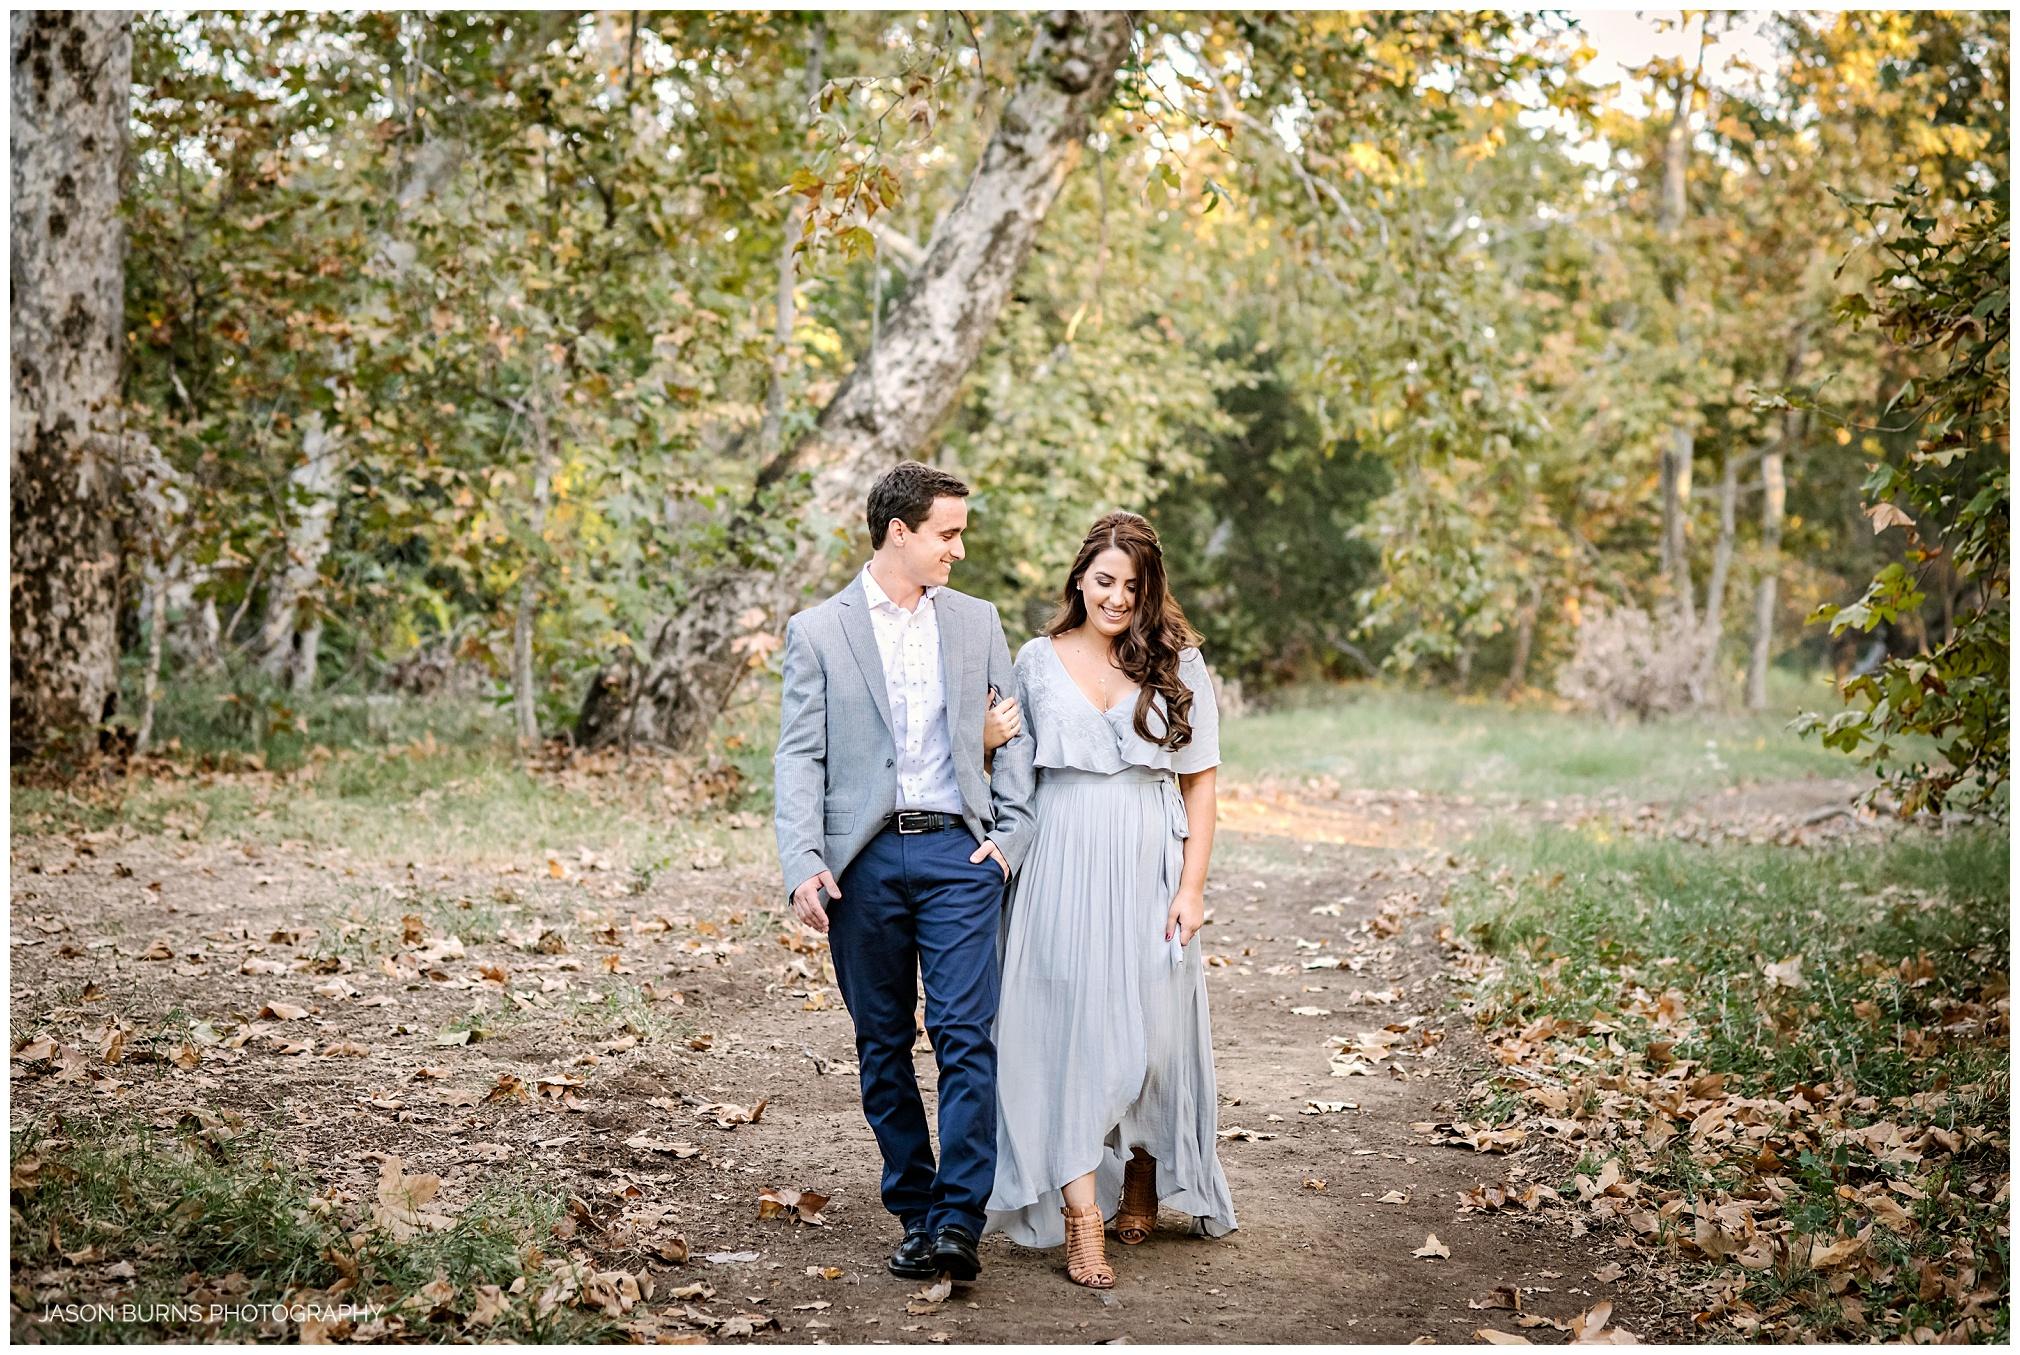 Irvine Wedding Photographer (7)